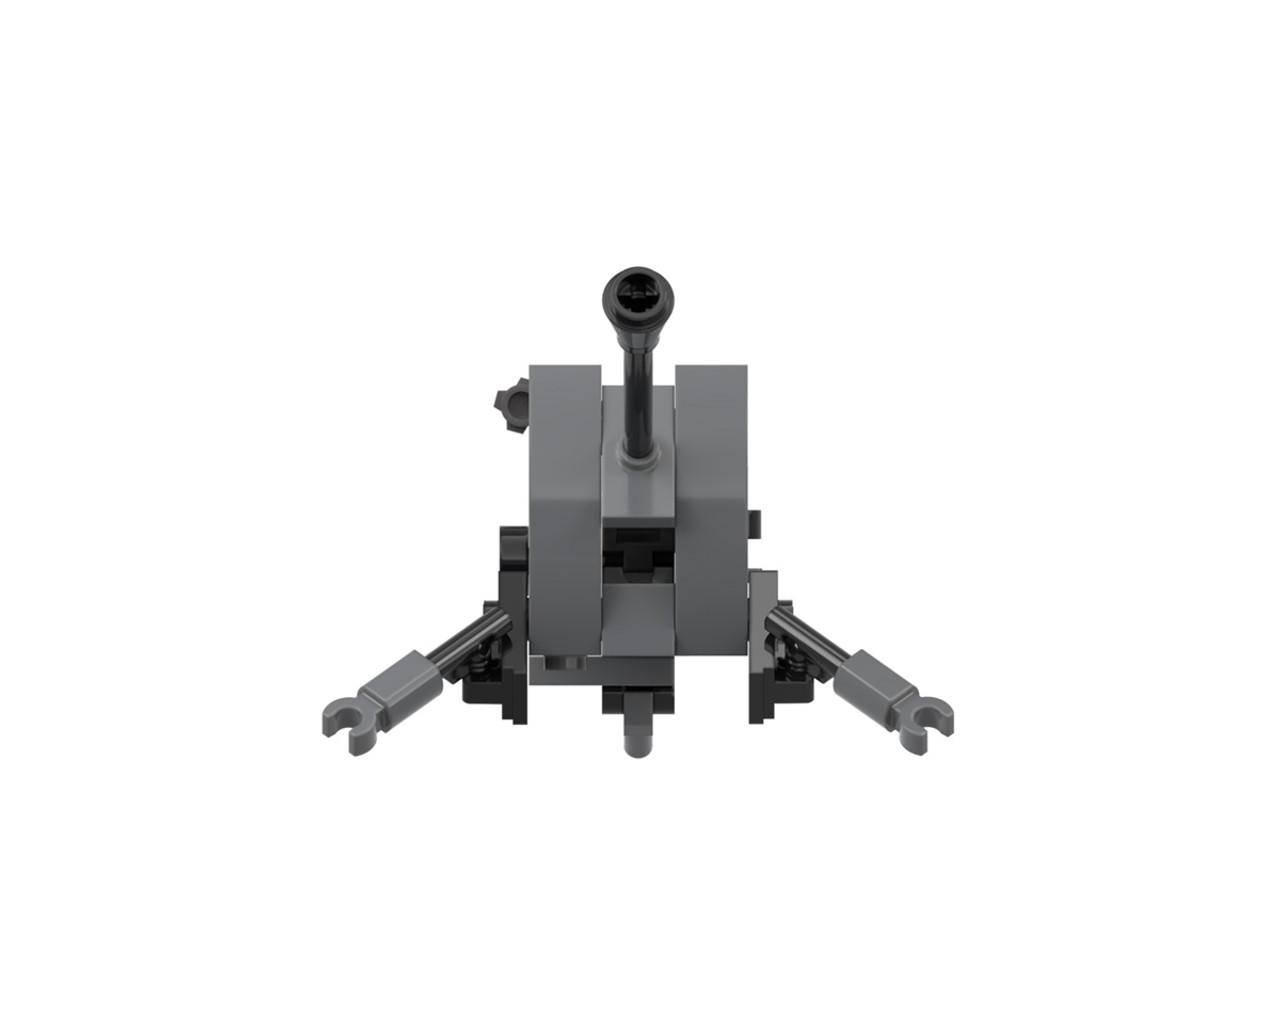 Gebirgsflak 38 - 20mm Anti-Aircraft Gun